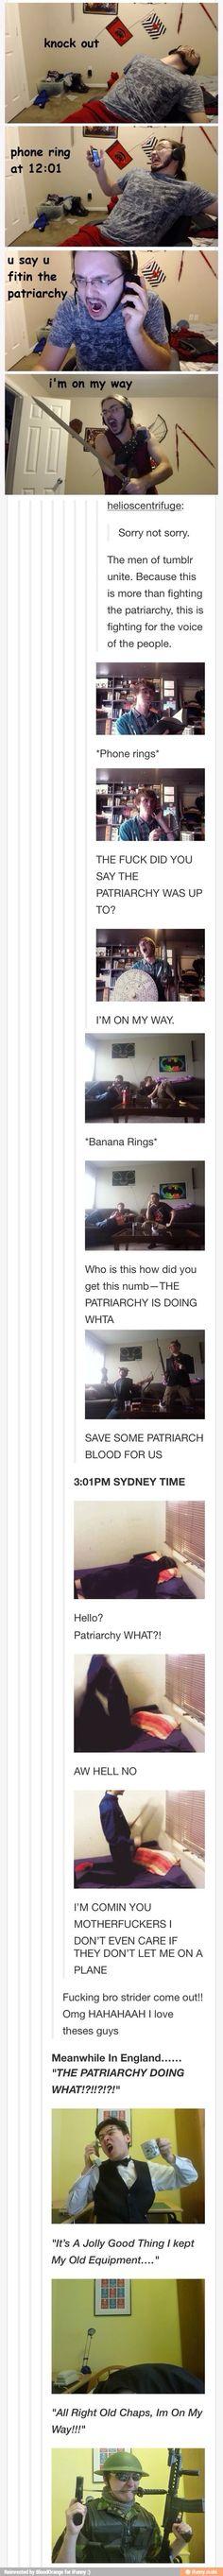 The men of tumblr